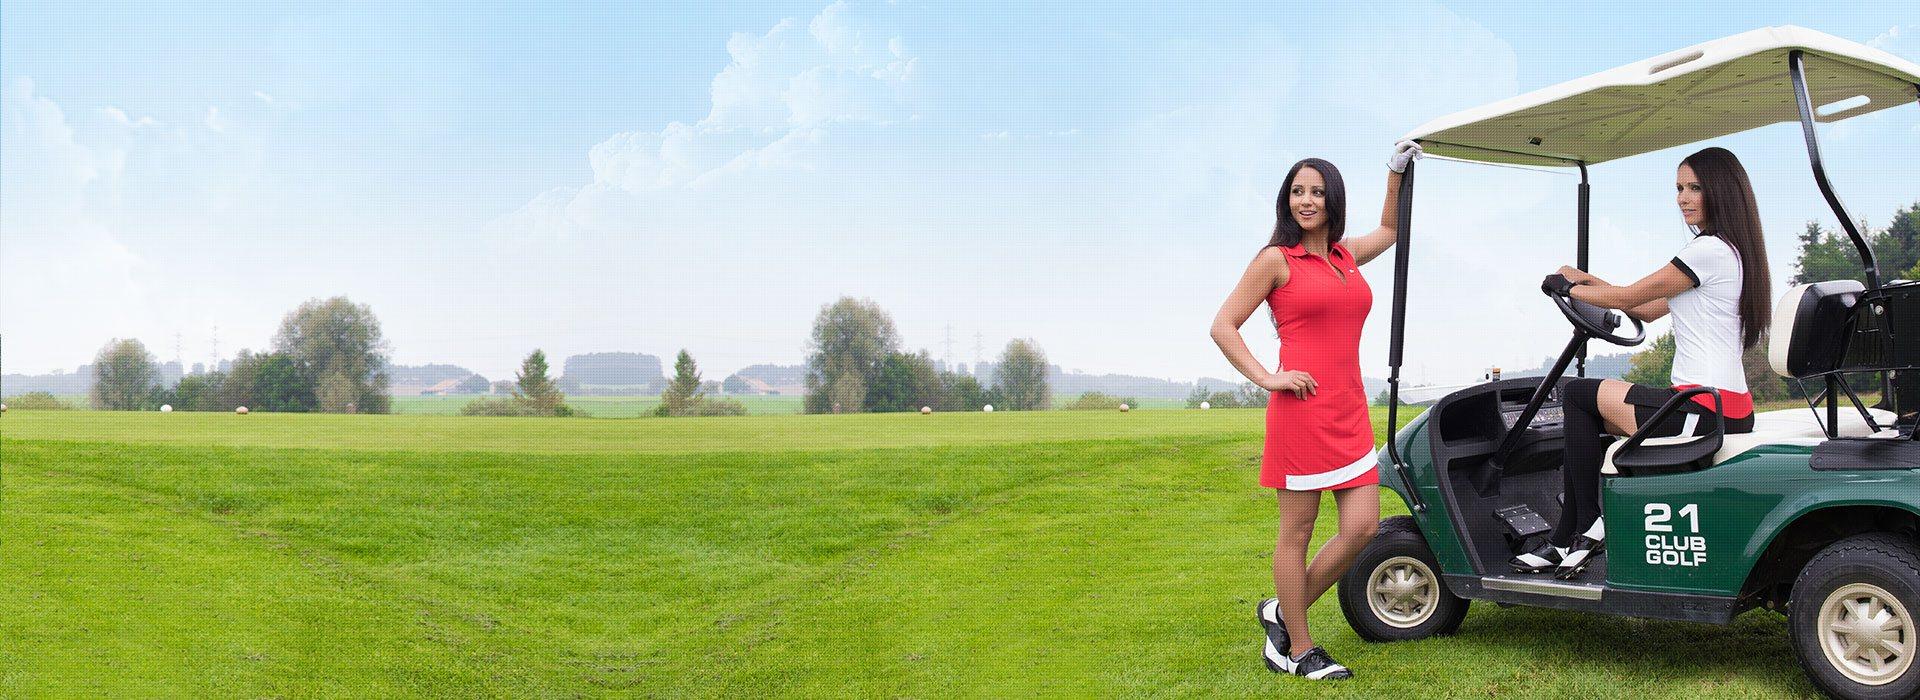 Golfkleid